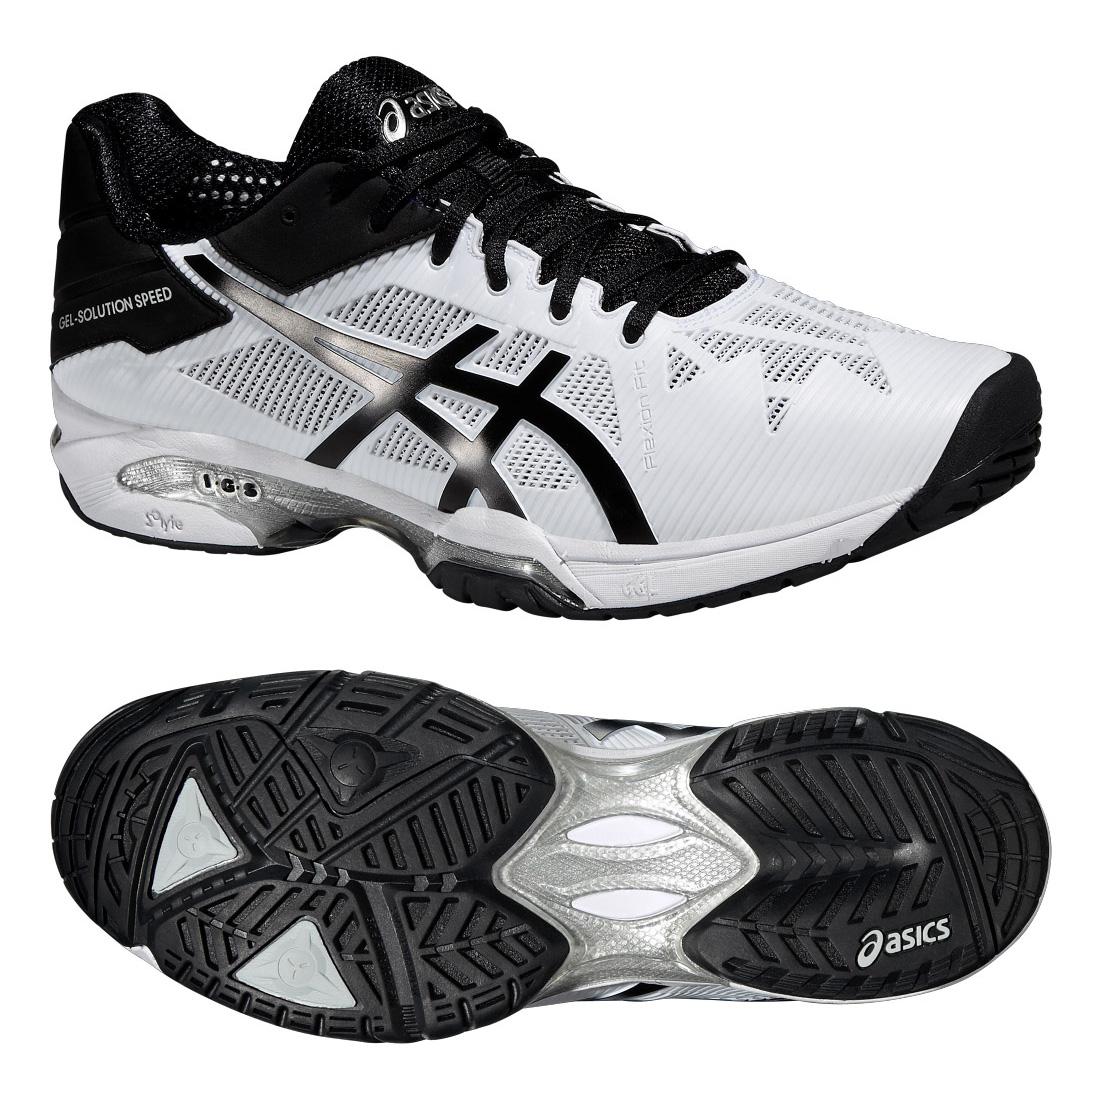 Asics GelSolution Speed 3 Mens Tennis Shoes SS16  12 UK